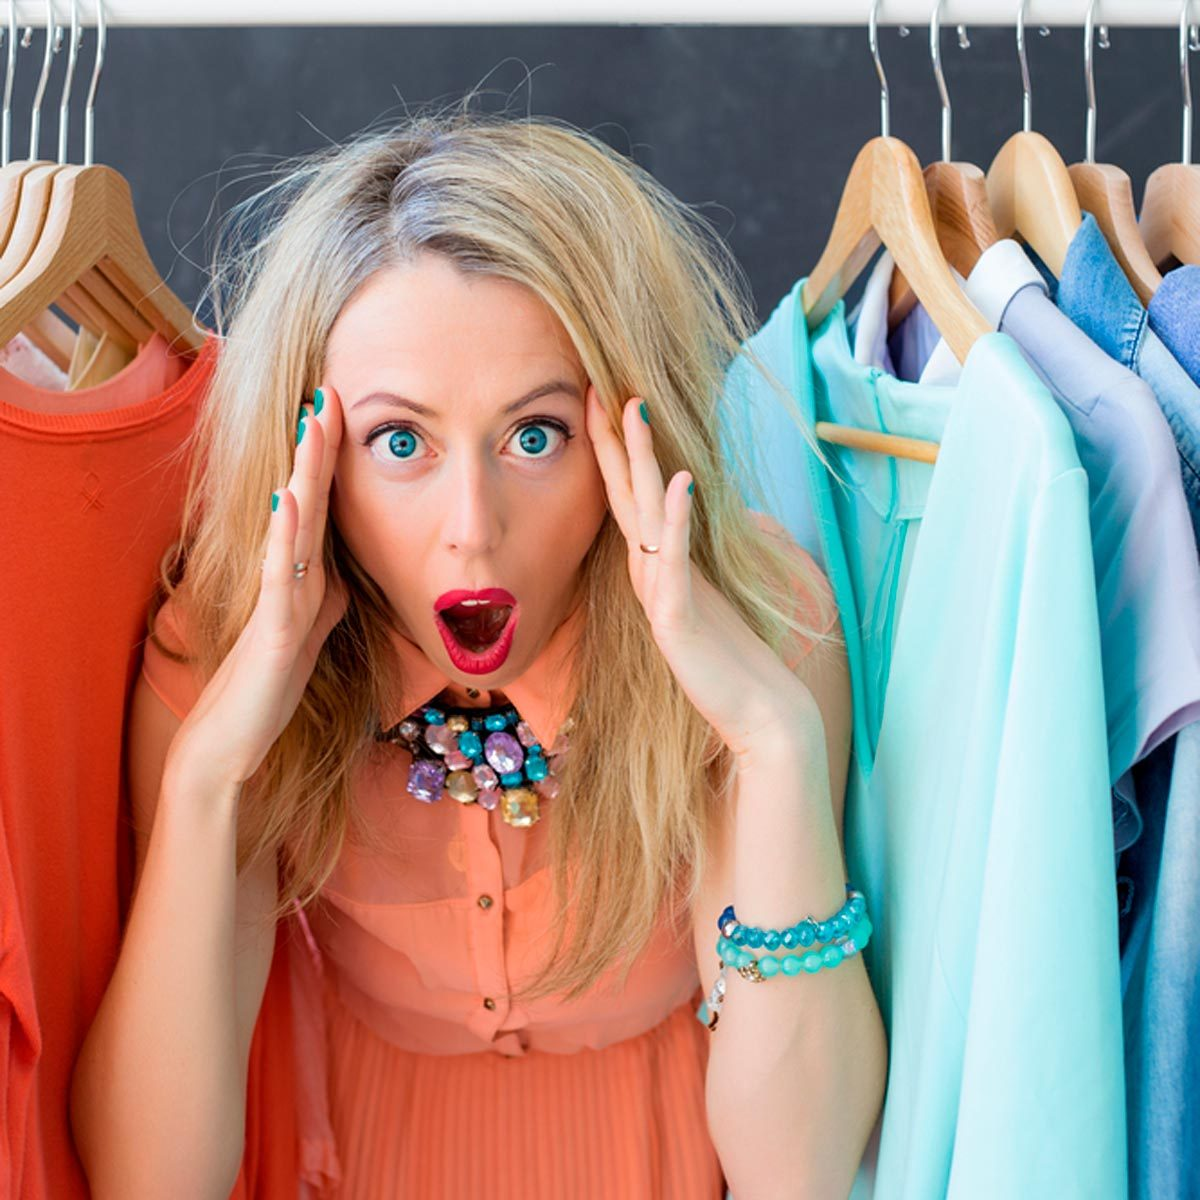 girl inside closet